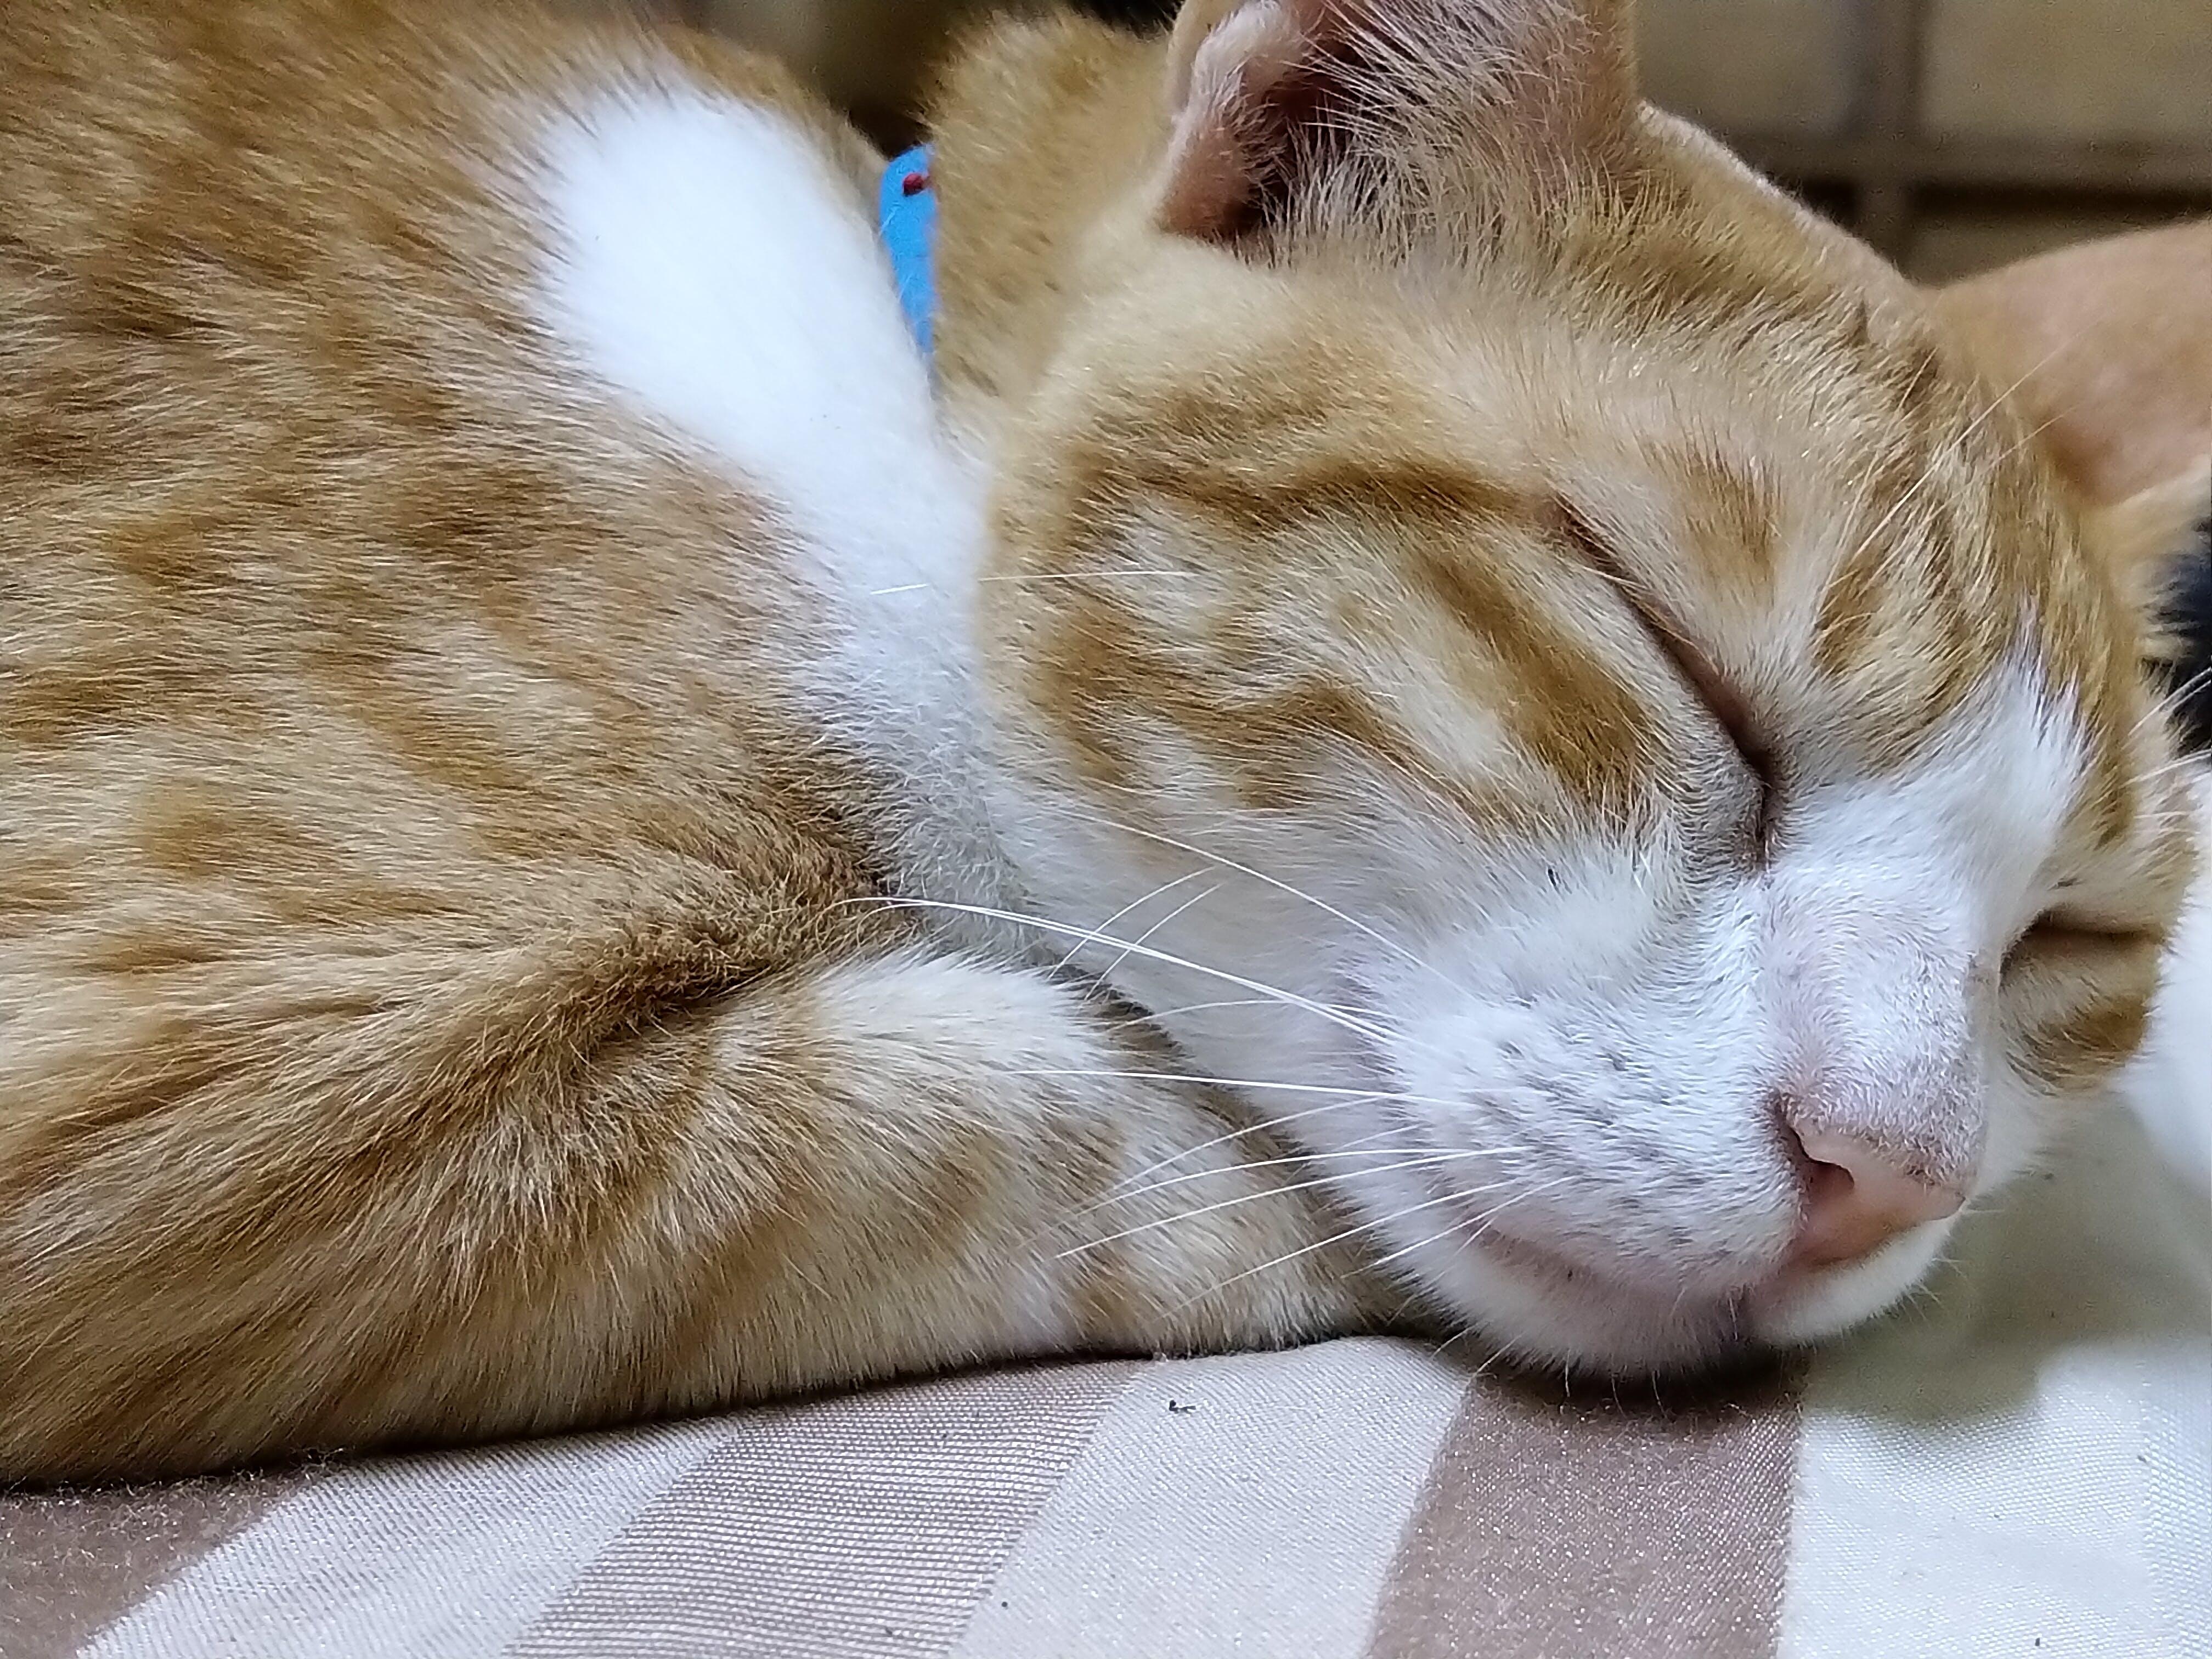 Free stock photo of Sleeping peacefully cat